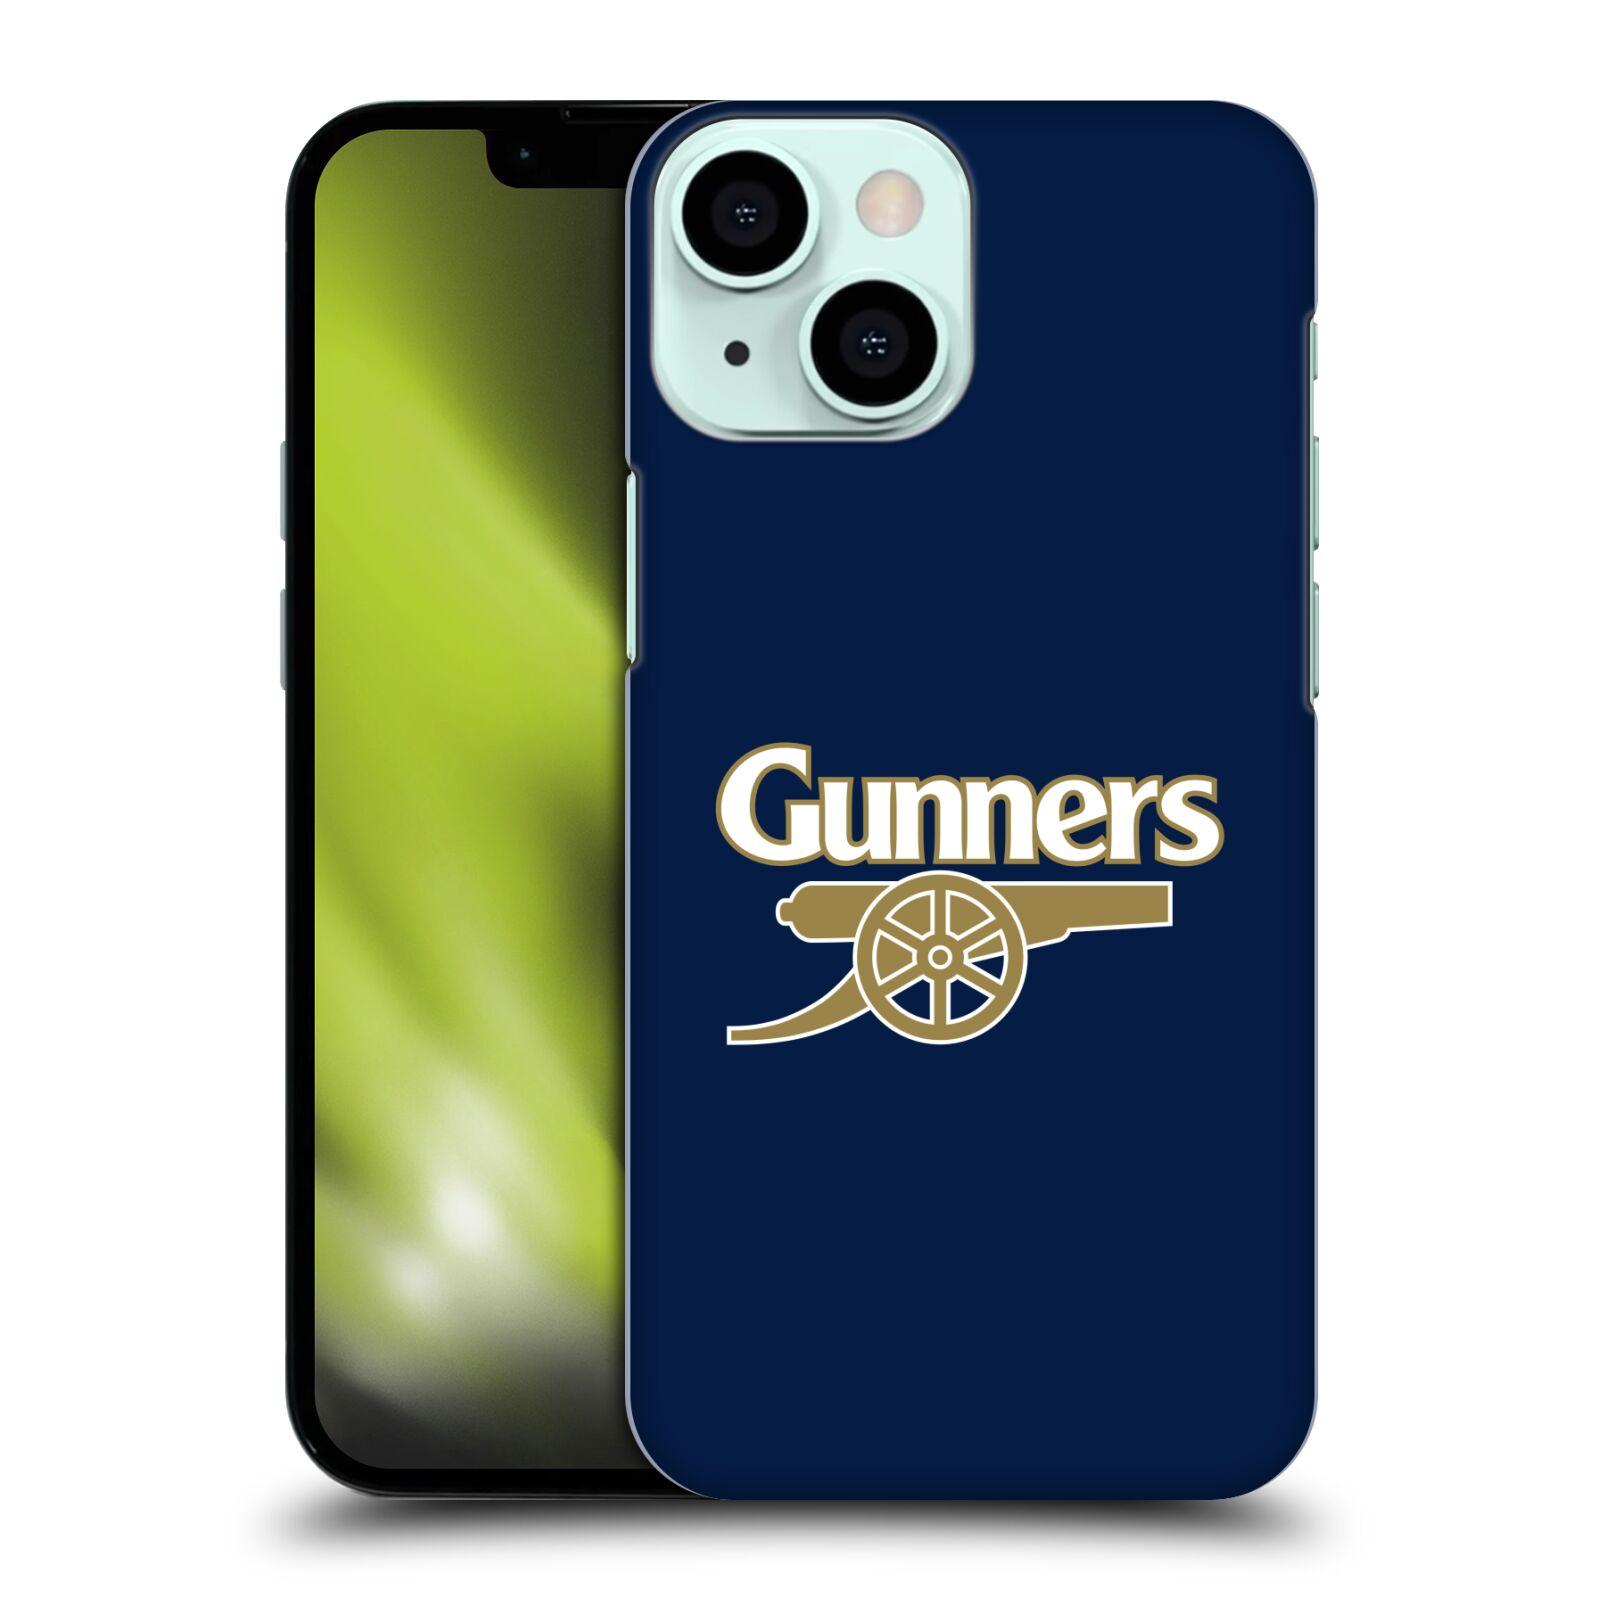 Plastové pouzdro na mobil Apple iPhone 13 Mini - Head Case - Arsenal FC - Gunners